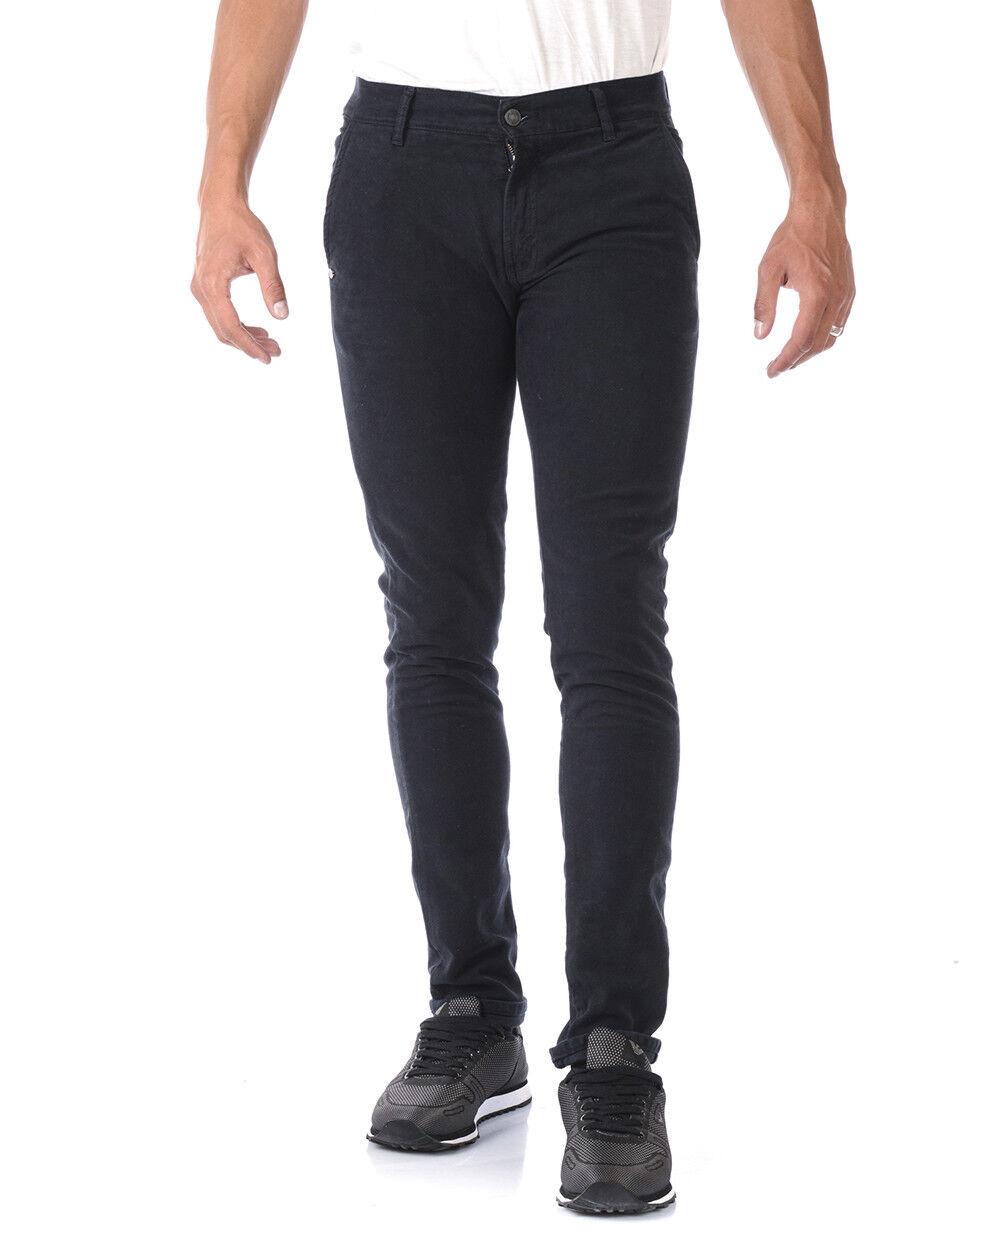 Jeans Daniele Alessandrini Jeans Cotone men blue PJ5605L5703706 23